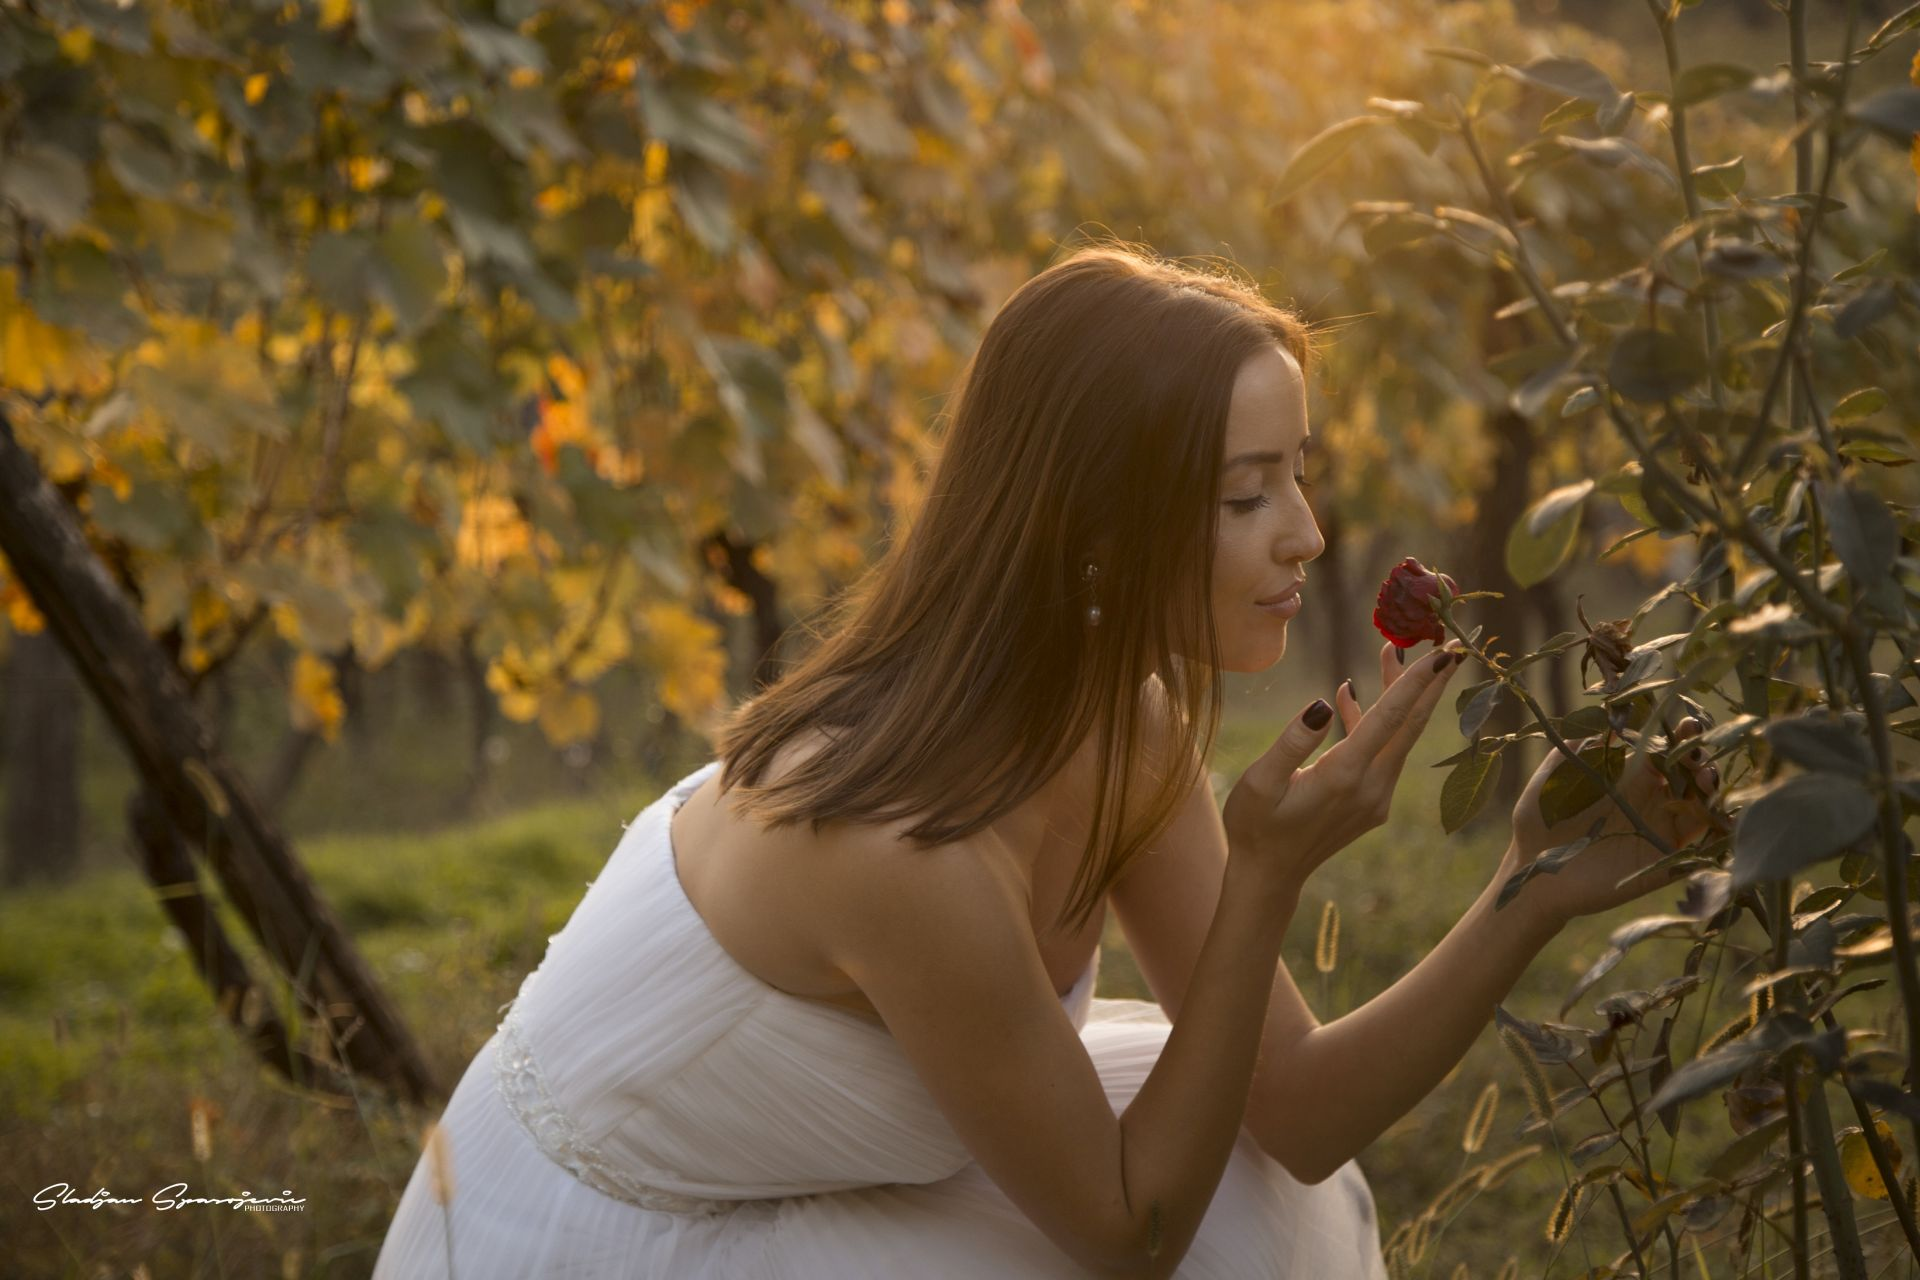 Sladjan Spasojevic Photography